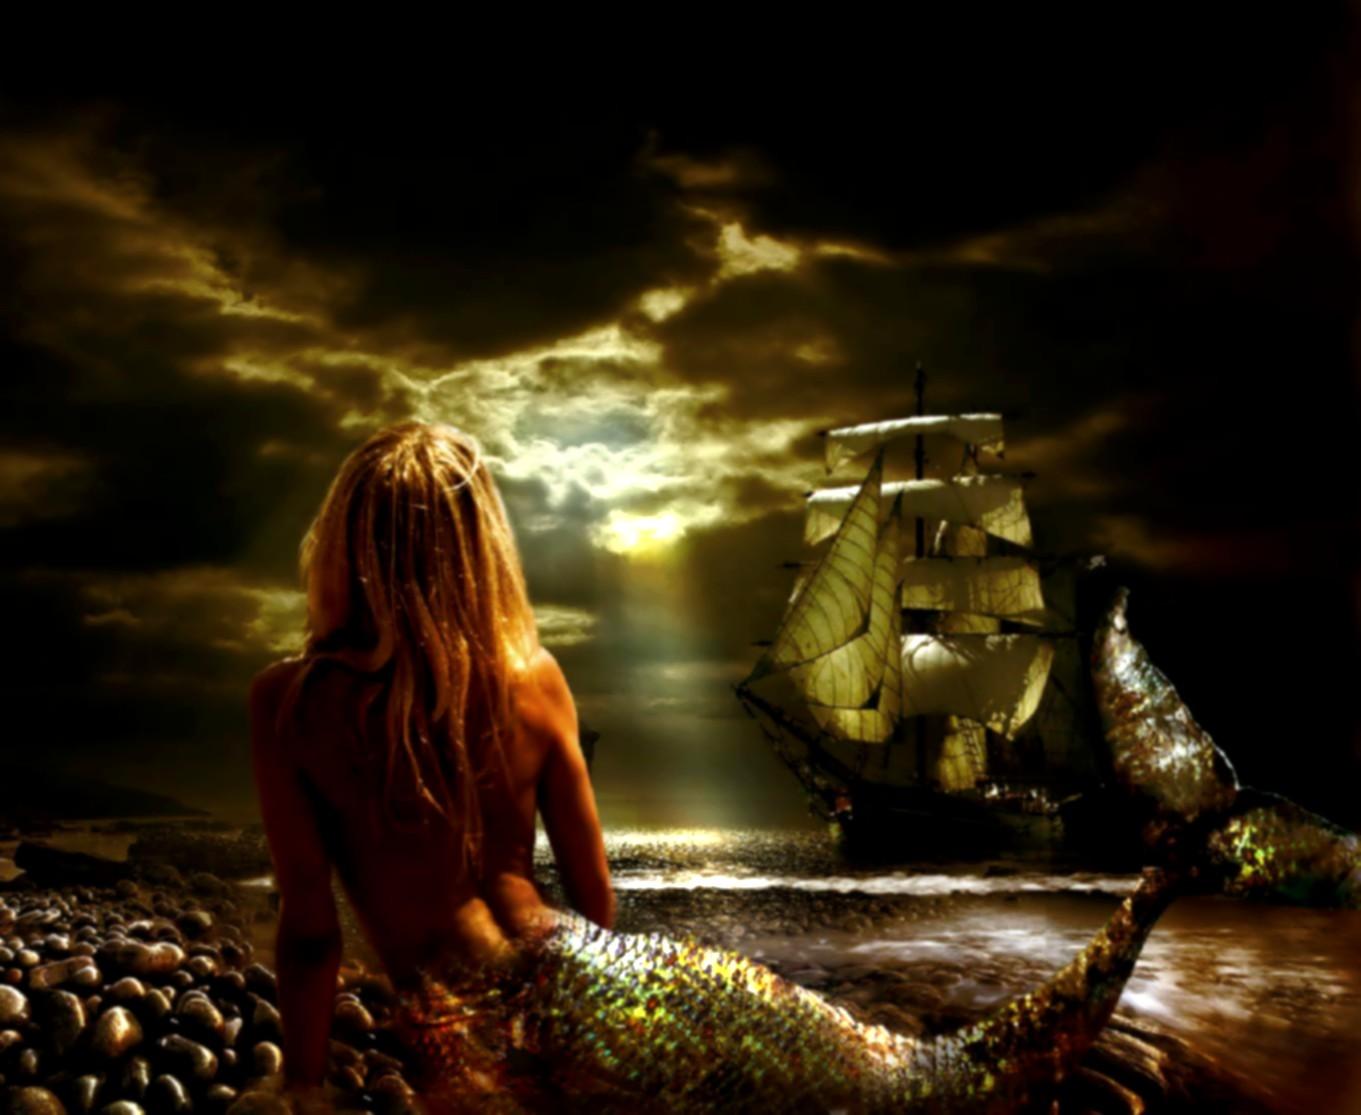 -LUNAS-MOONLIGHT - Página 17 Zzzzv+barco+sirena+03